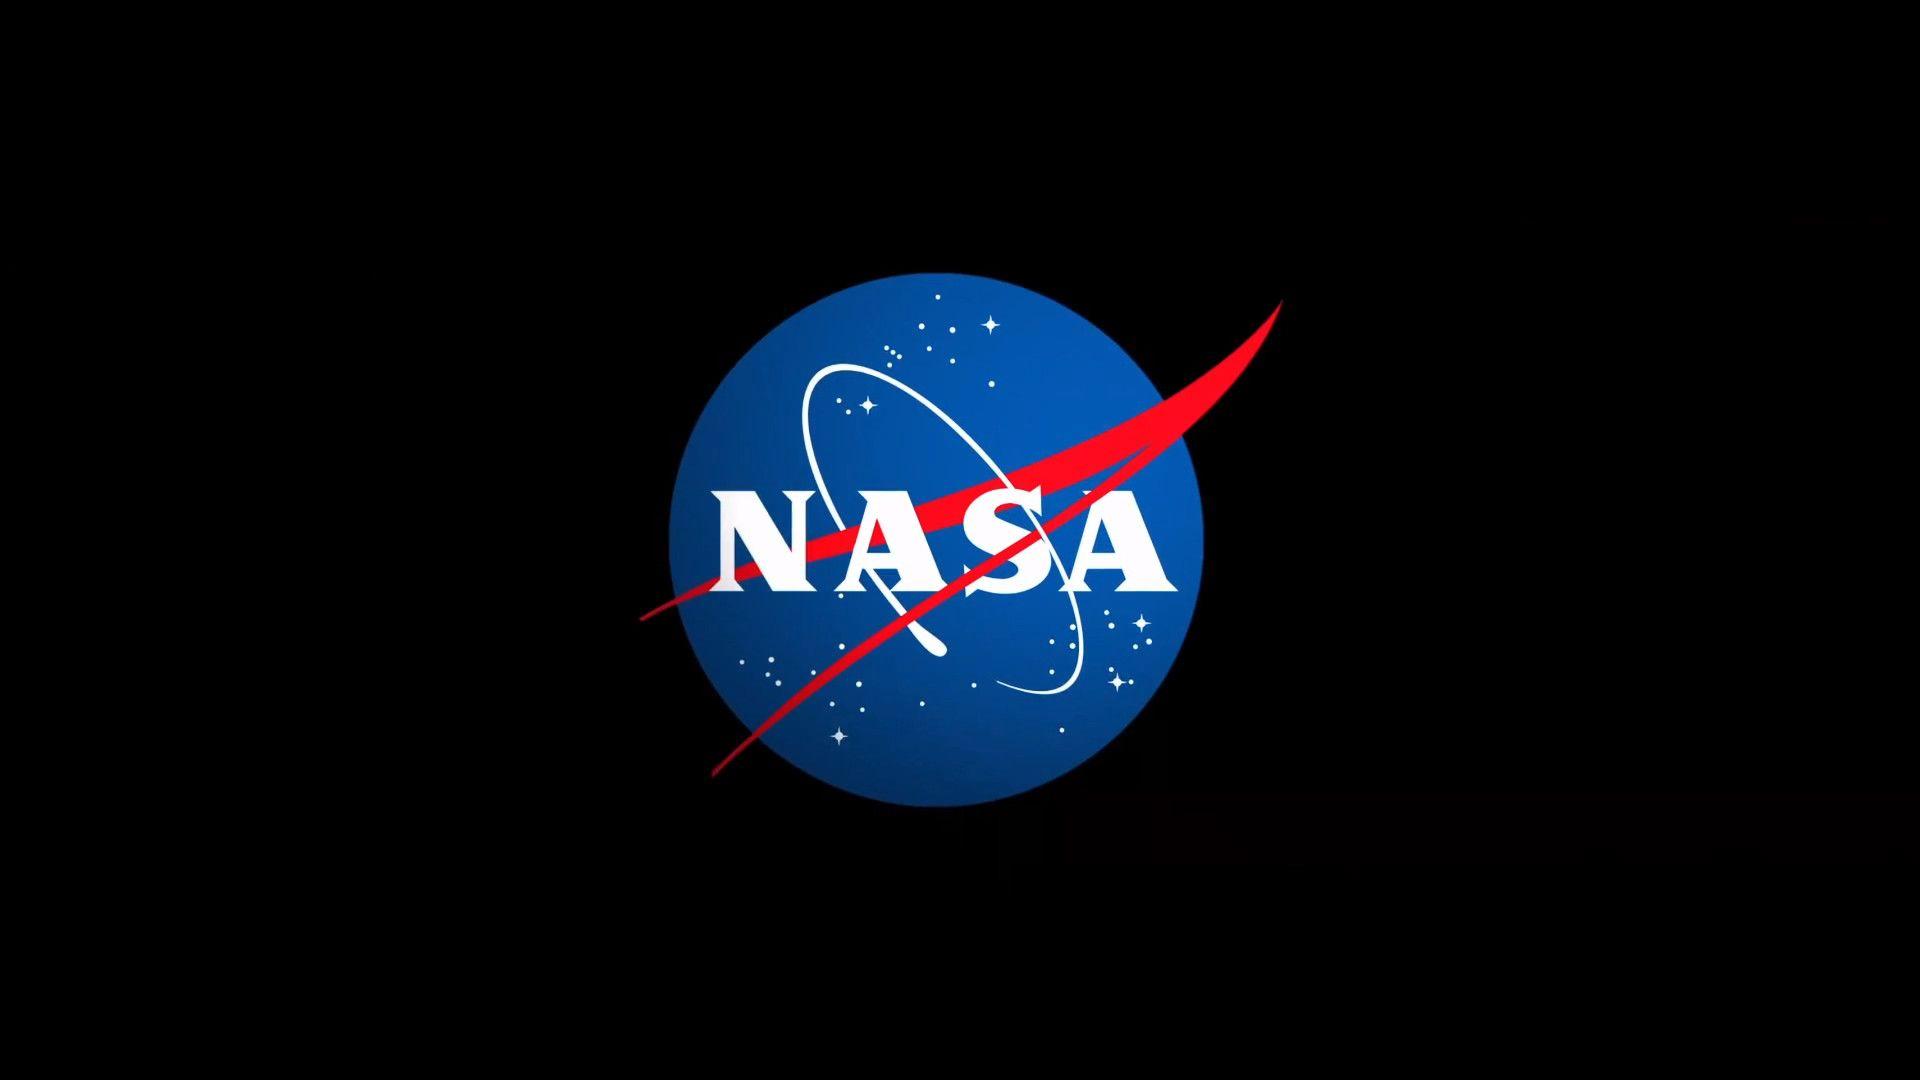 1920x1080 Fond D Ecran Logo Nasa In 2019 Nasa Background